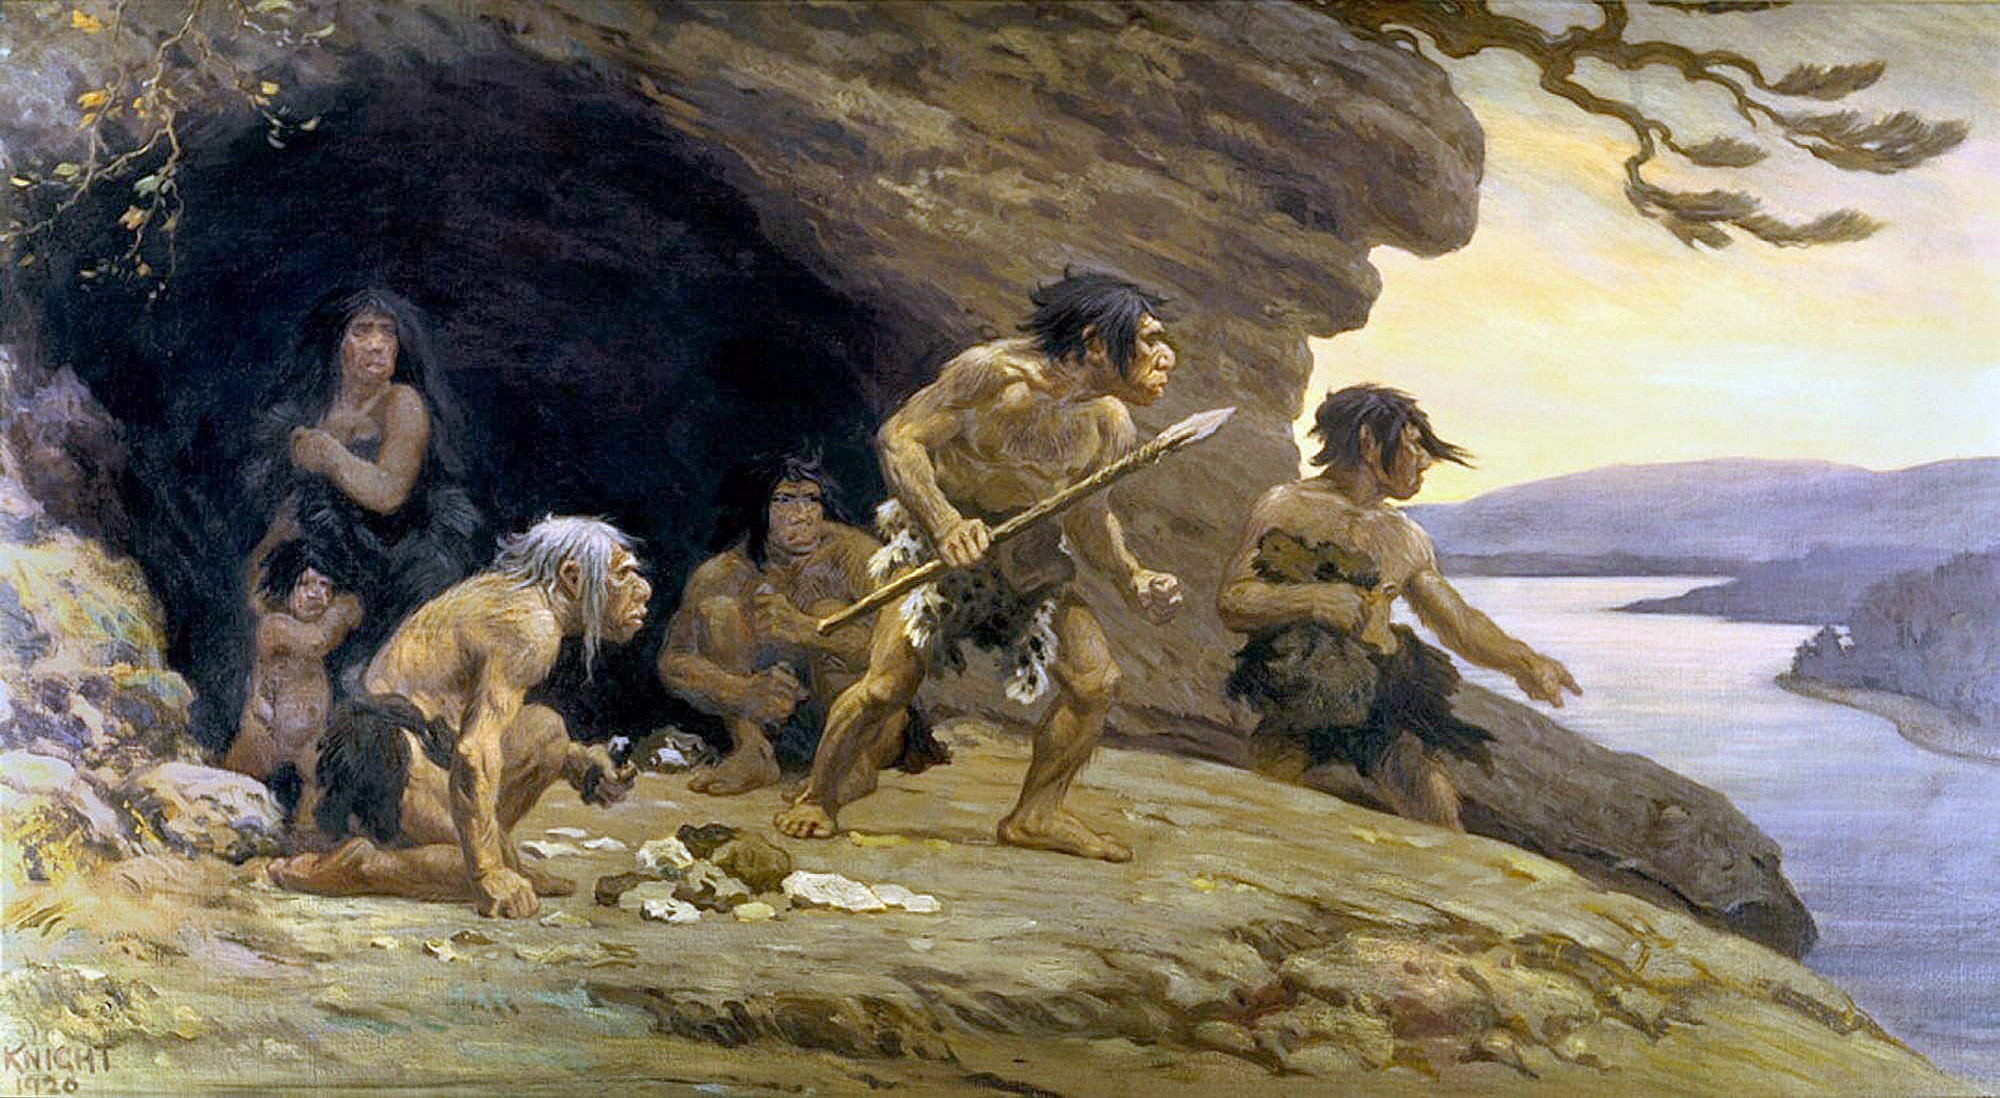 Неандертальцы у пещеры Ле-Мустье, юго-западная Франция (Charles Robert Knight, American Museum of Natural History).